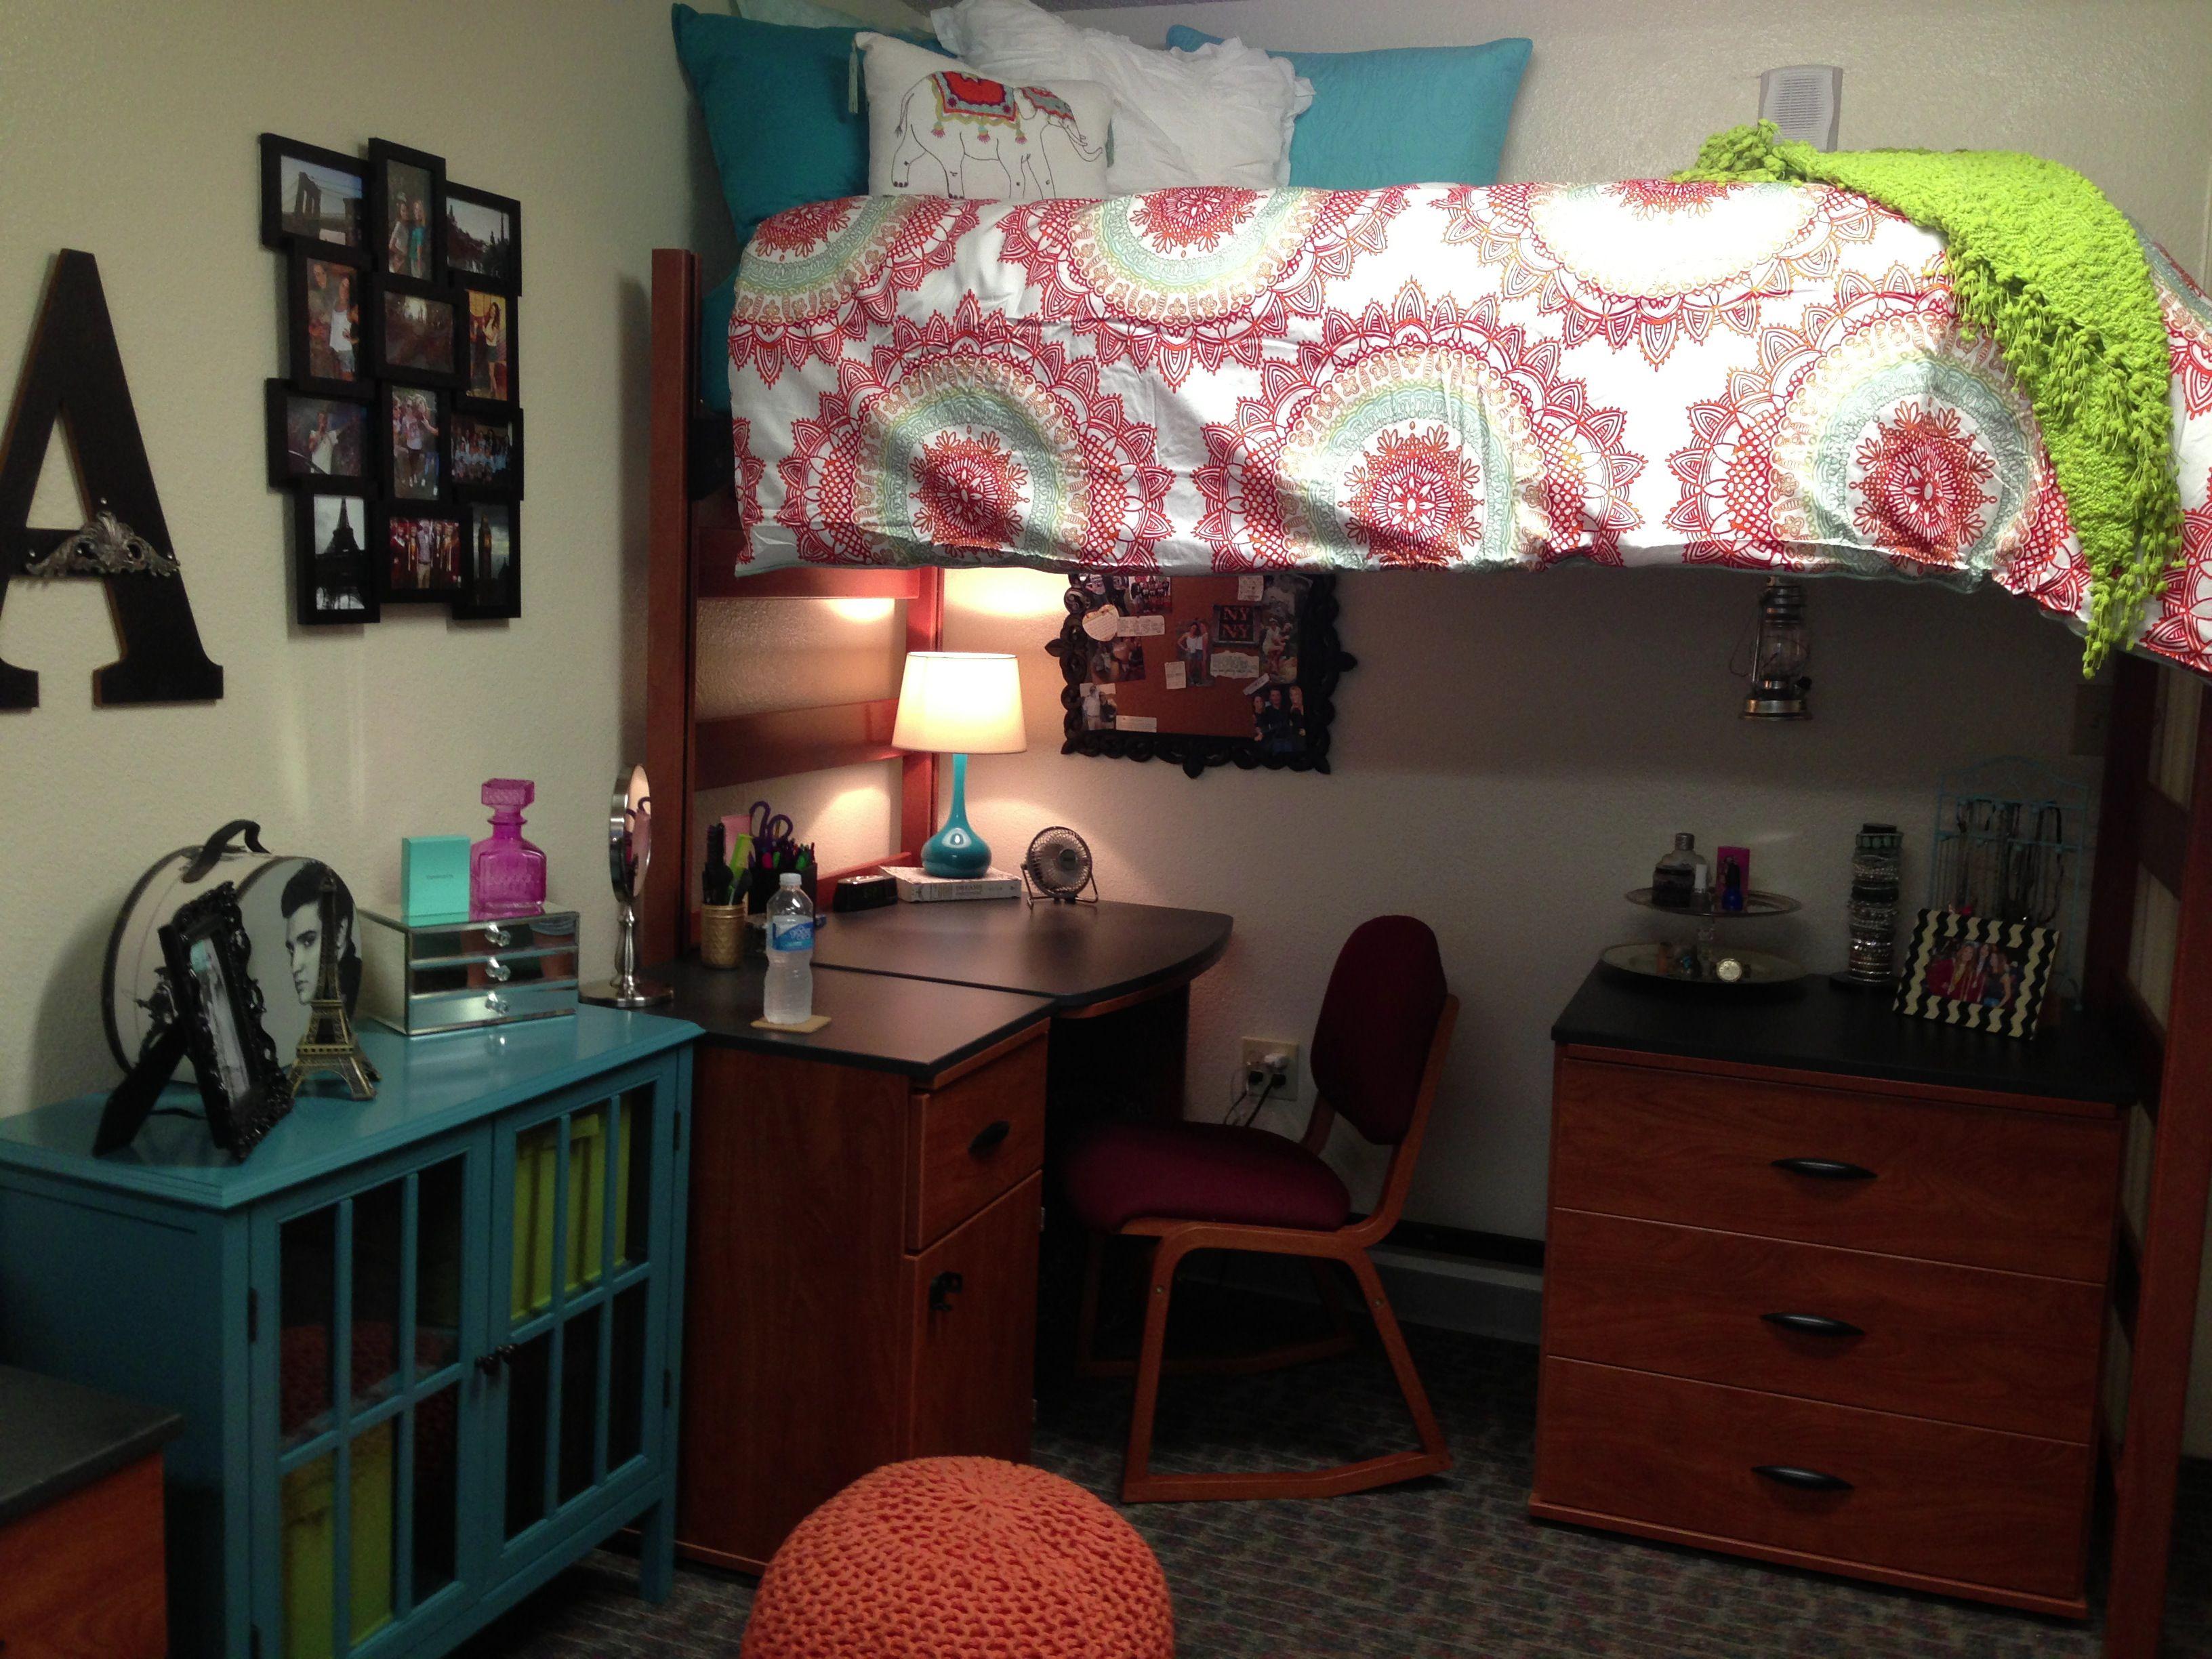 desk chair dresser underneath top bunk bed white bedspread w circle tie dye like pattern. Black Bedroom Furniture Sets. Home Design Ideas